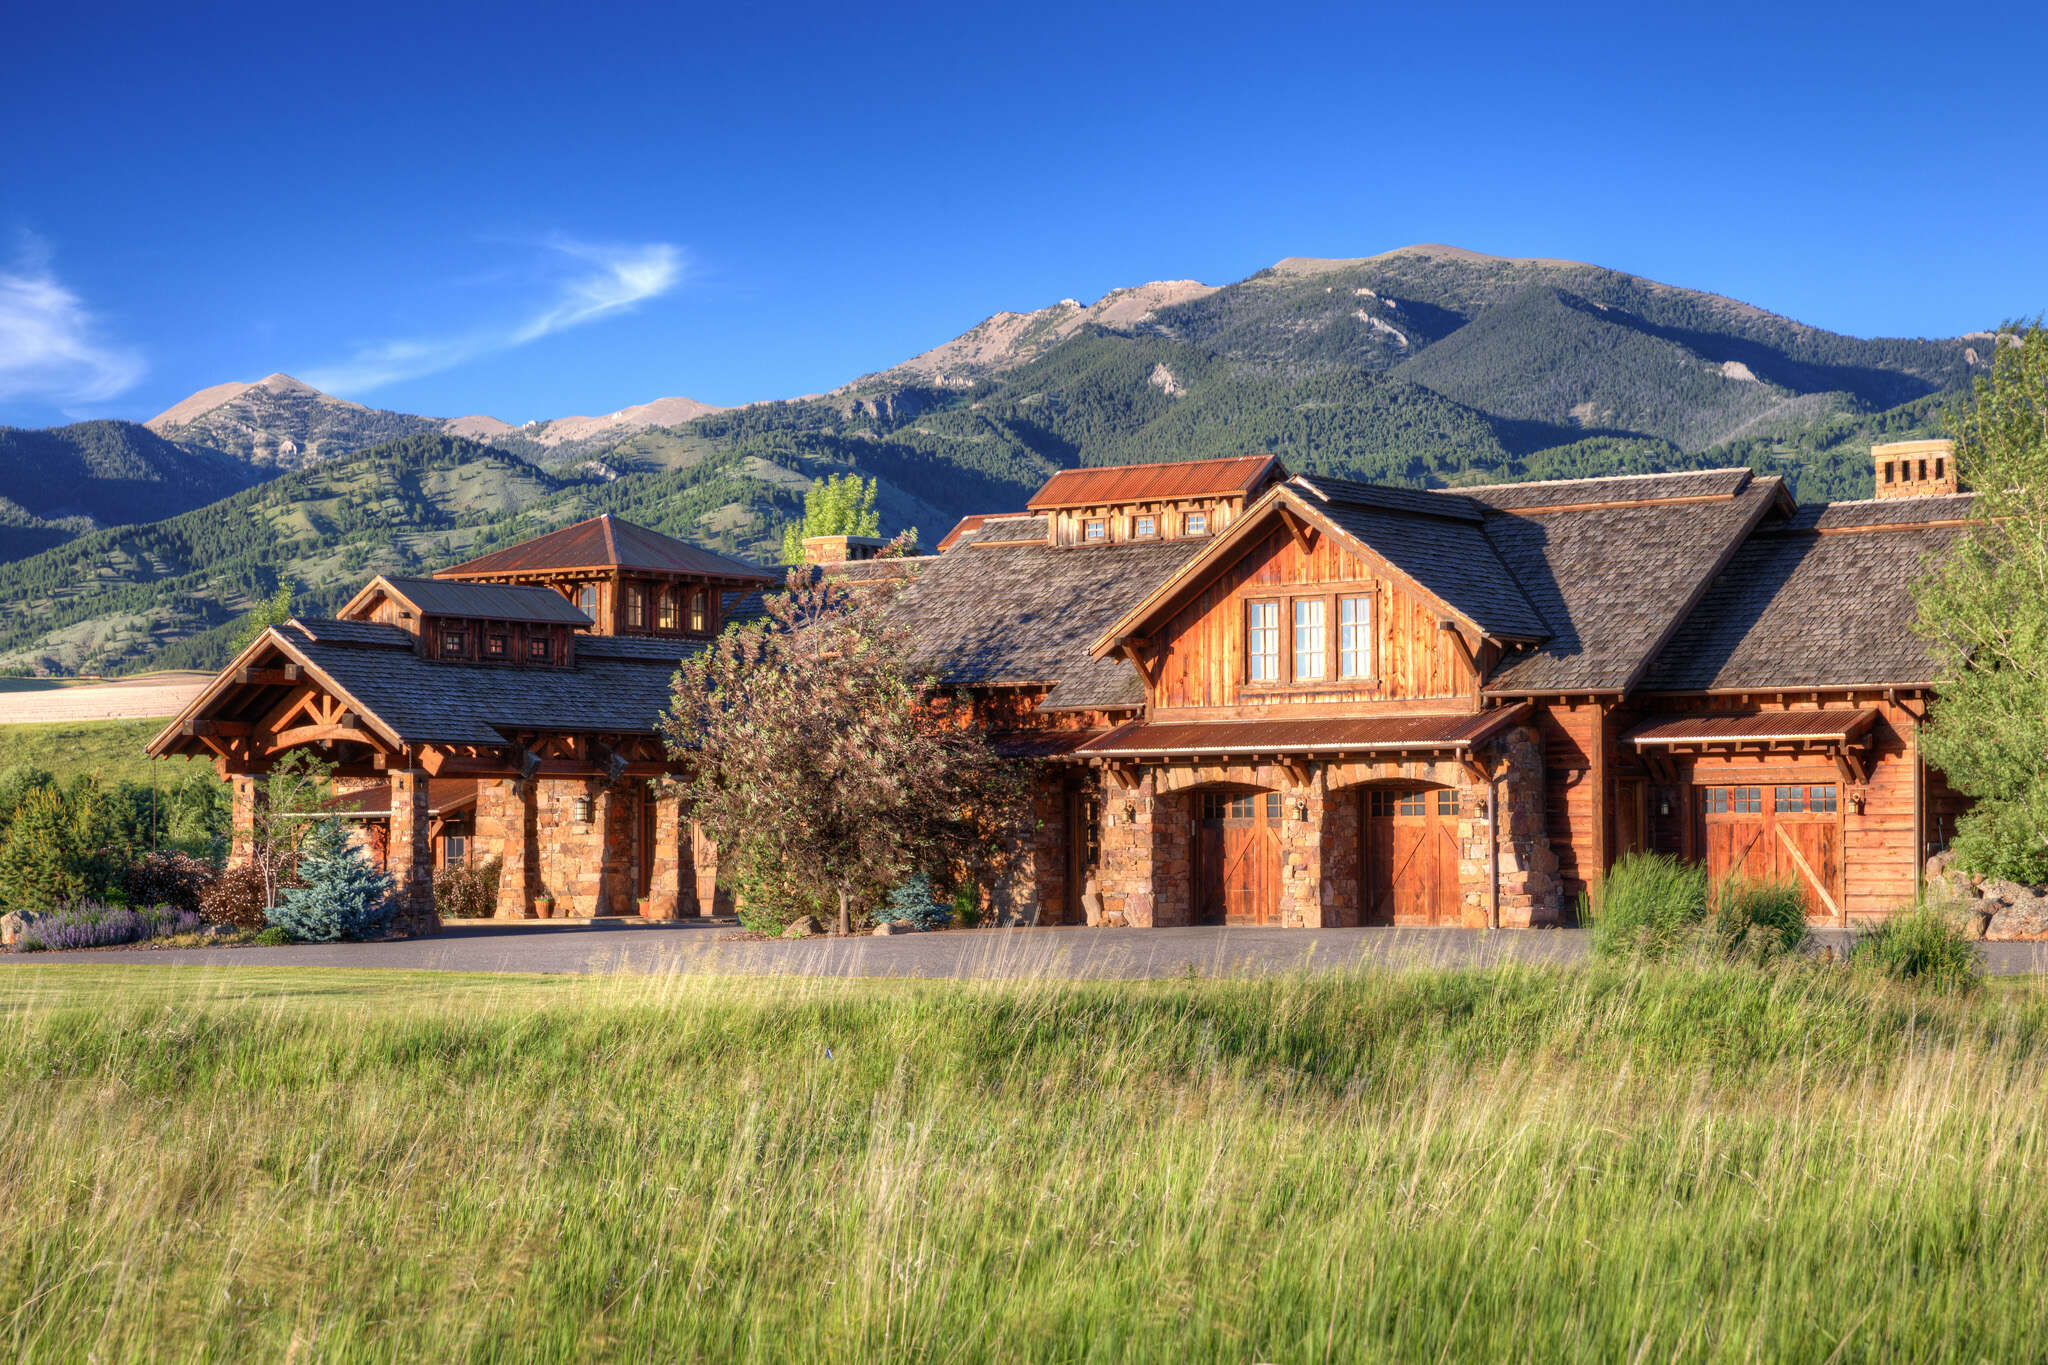 Single Family for Sale at 200 Jeana Lei Ct Bozeman, Montana 59715 United States